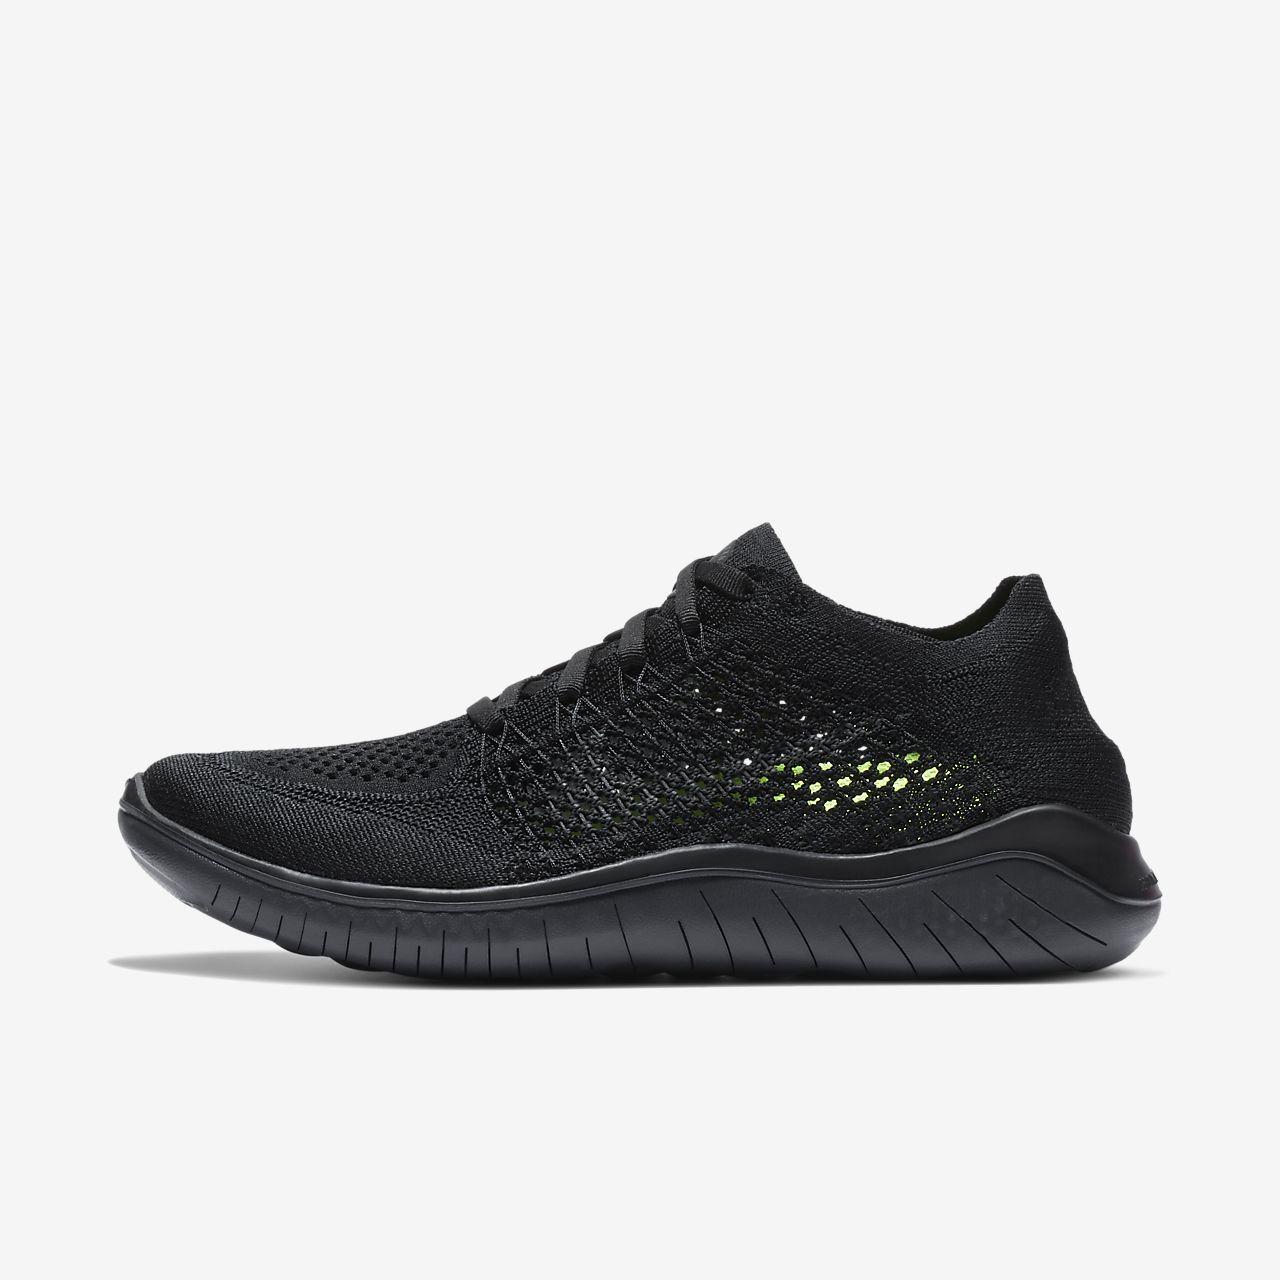 Wmns Nike Libre Rn Flyknit 2018 - Chaussures Pour Femmes / Noir Nike tXIiQTJY